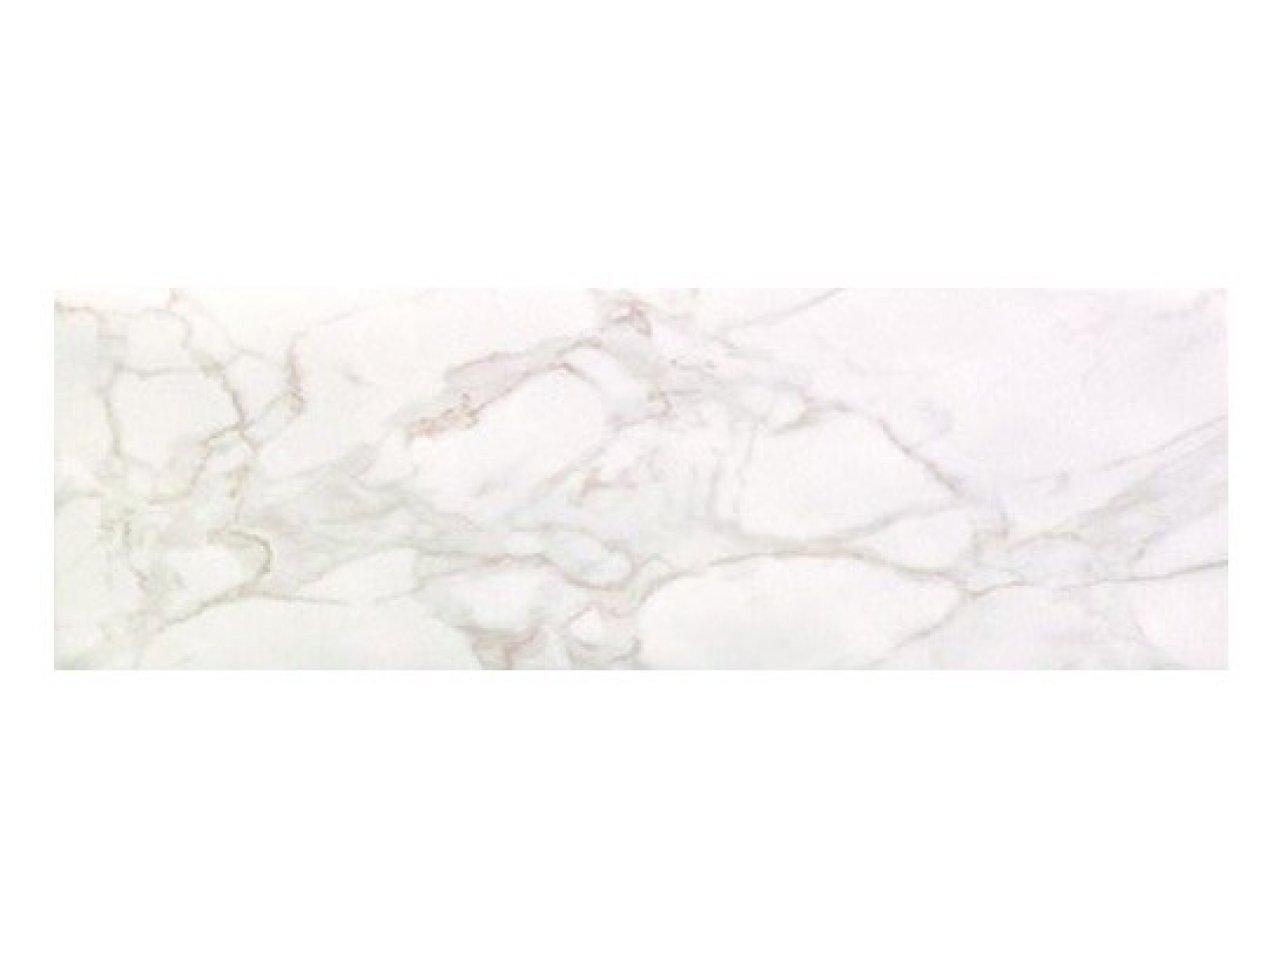 Настенная плитка FAP Roma Calacatta 75 x 25 см, Арт. fLSN